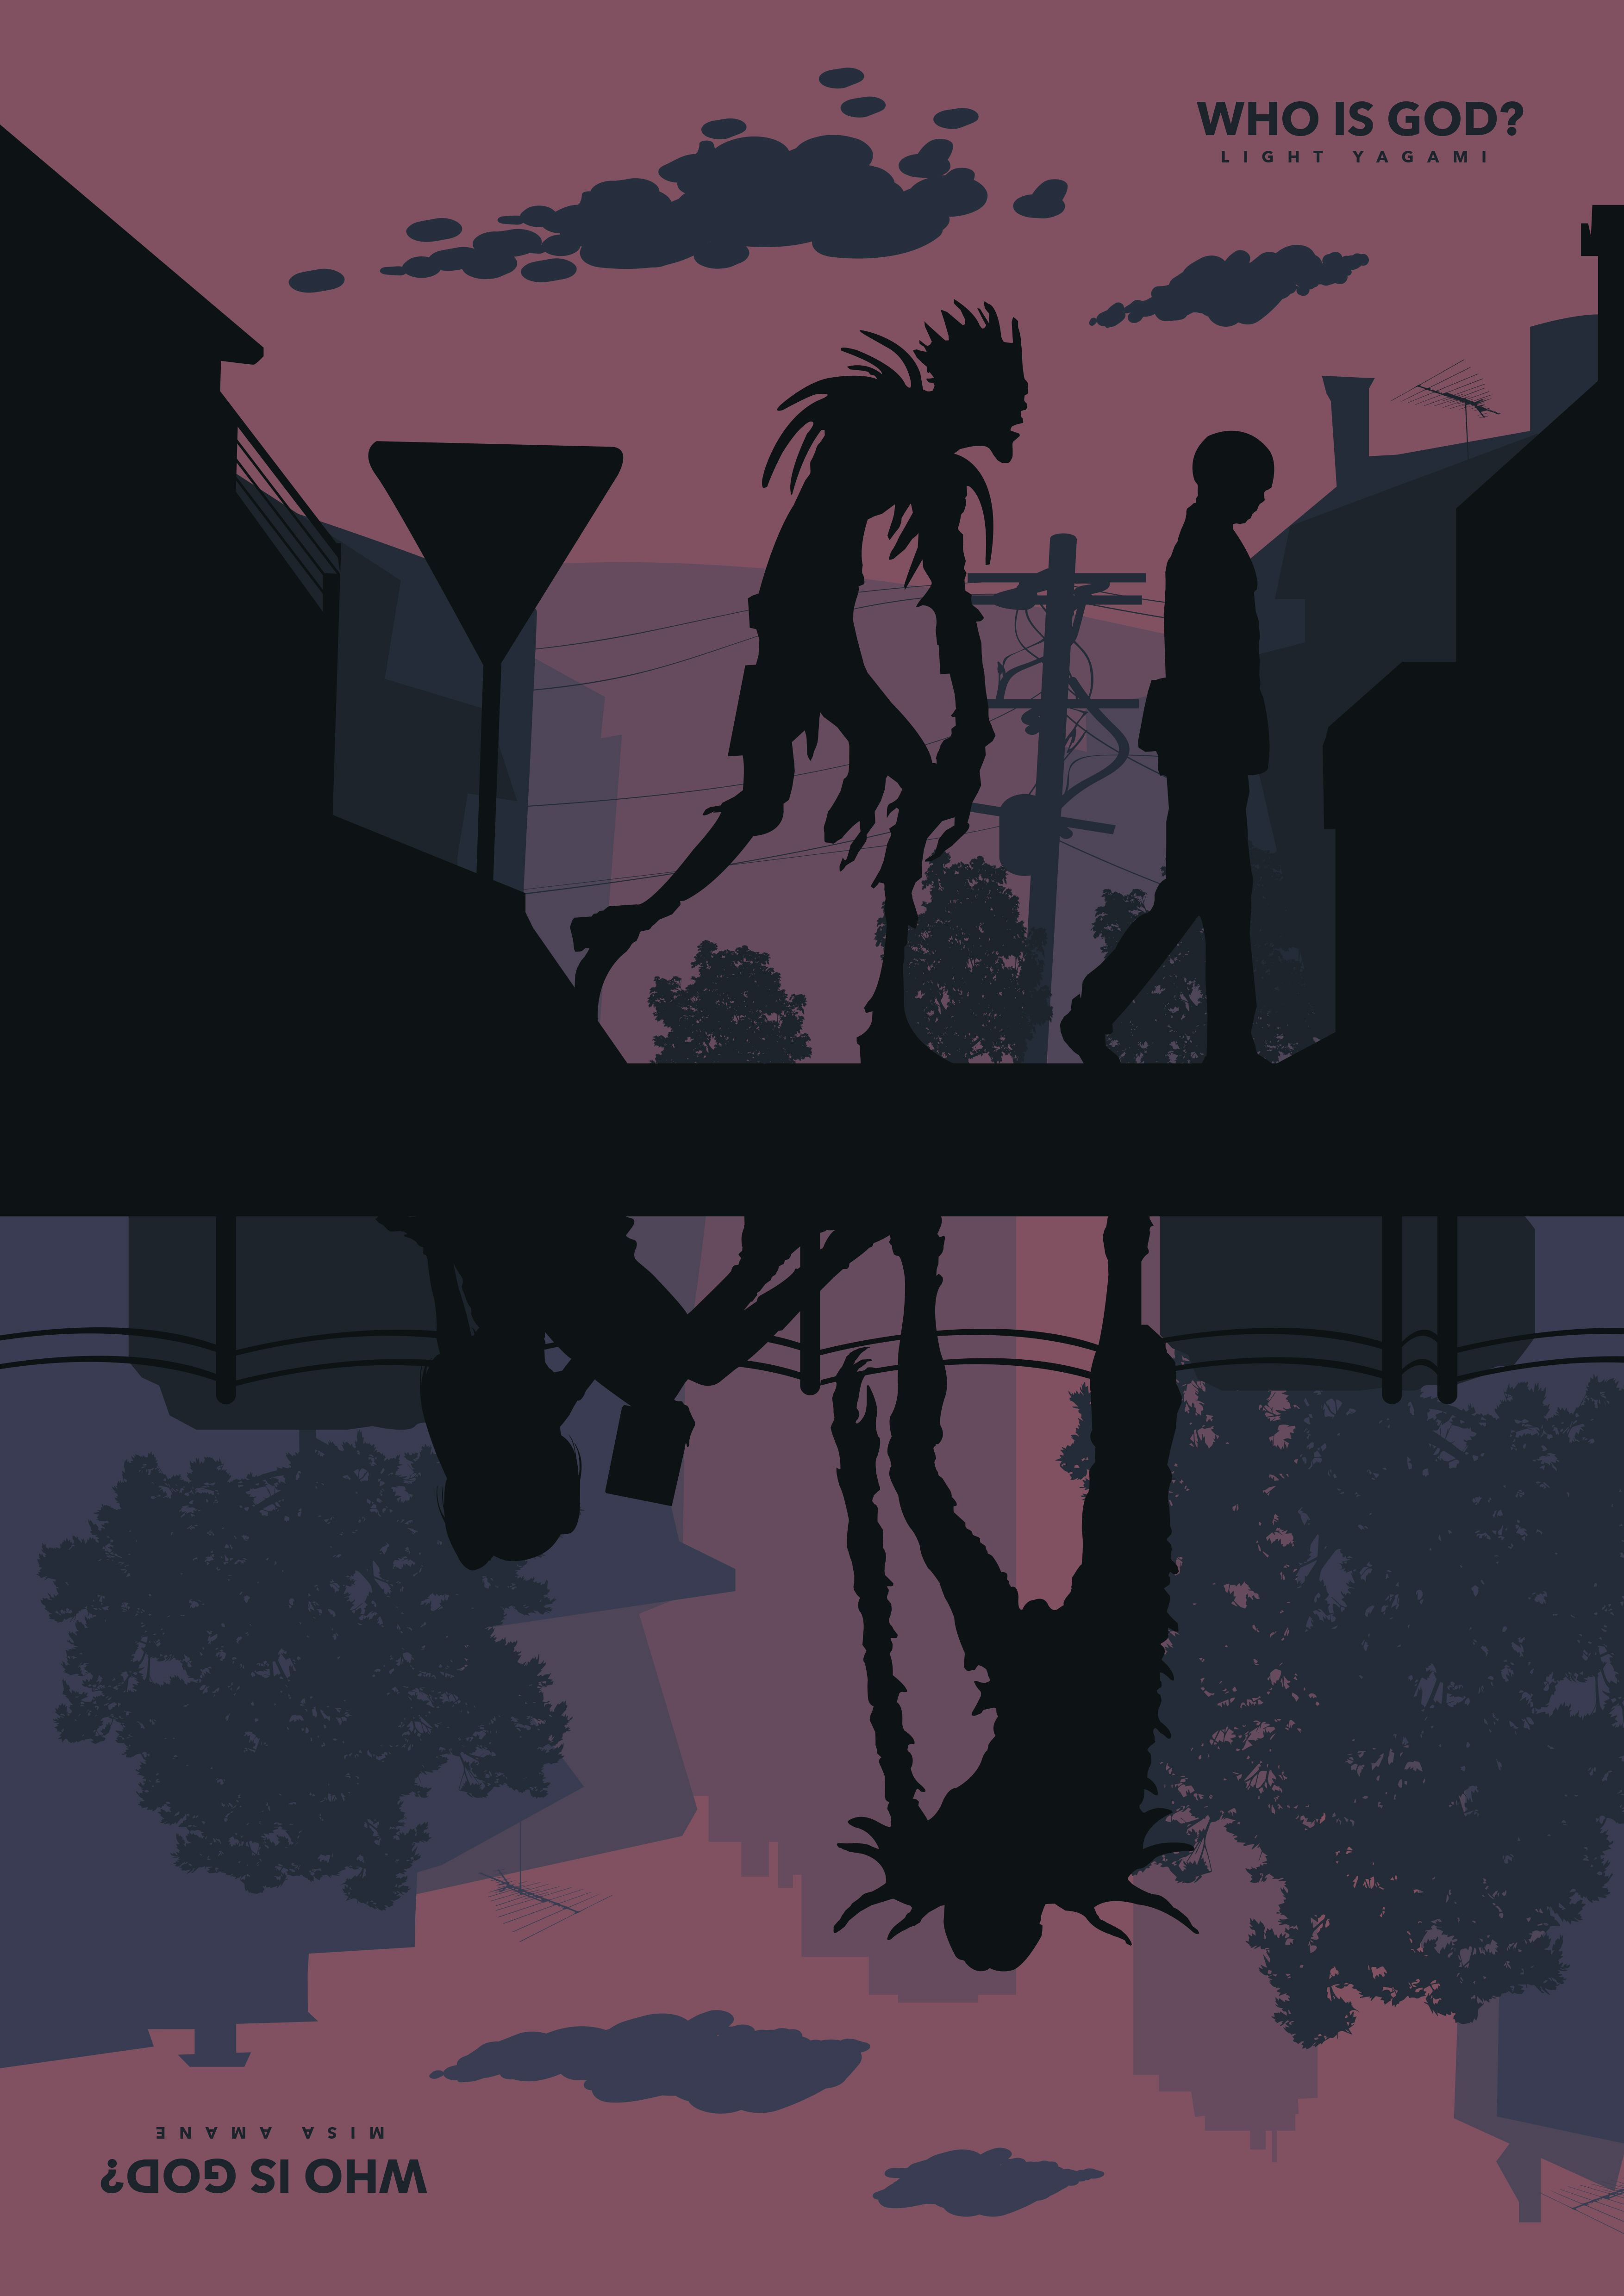 Photo of Death Note A3 A4 Digital Poster minimalist Shinigami Print Series Tv Netflix anime manga Movie